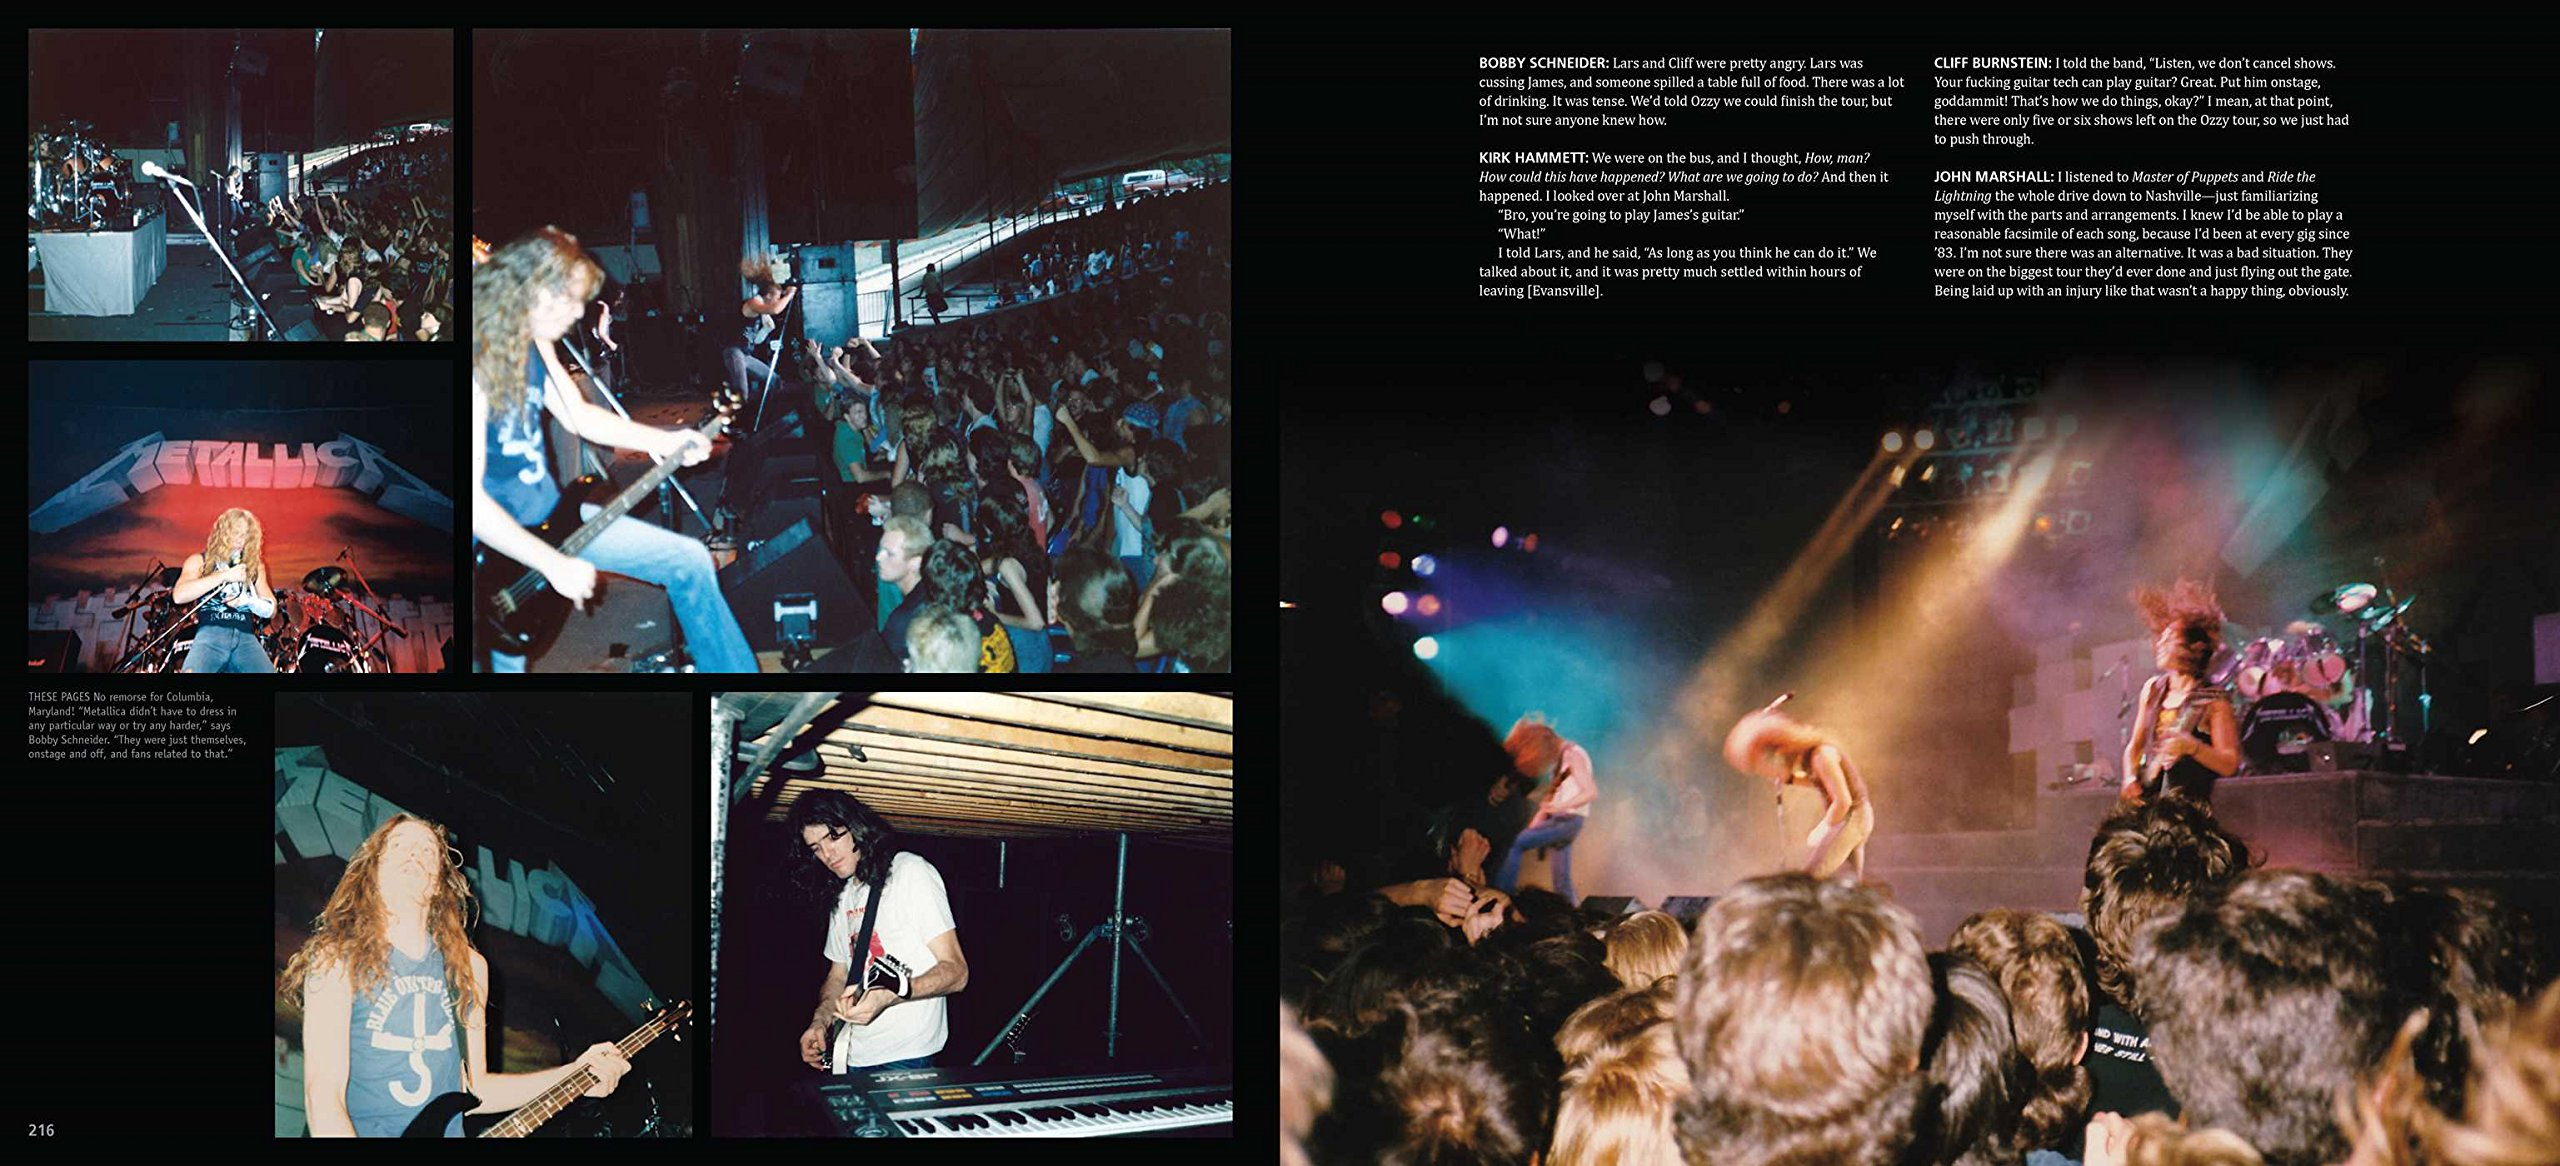 Literatura rock - Página 27 81EhY9wLSXL